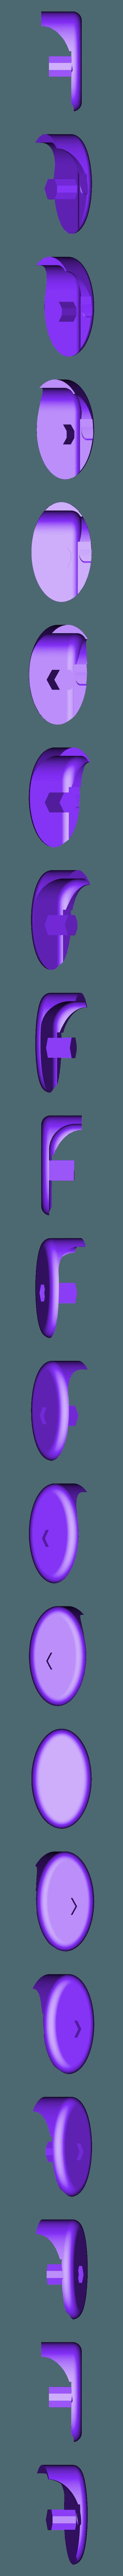 Eye_House_Left.stl Download free STL file Rainbow Toucan • 3D printing template, 3rdesignworks